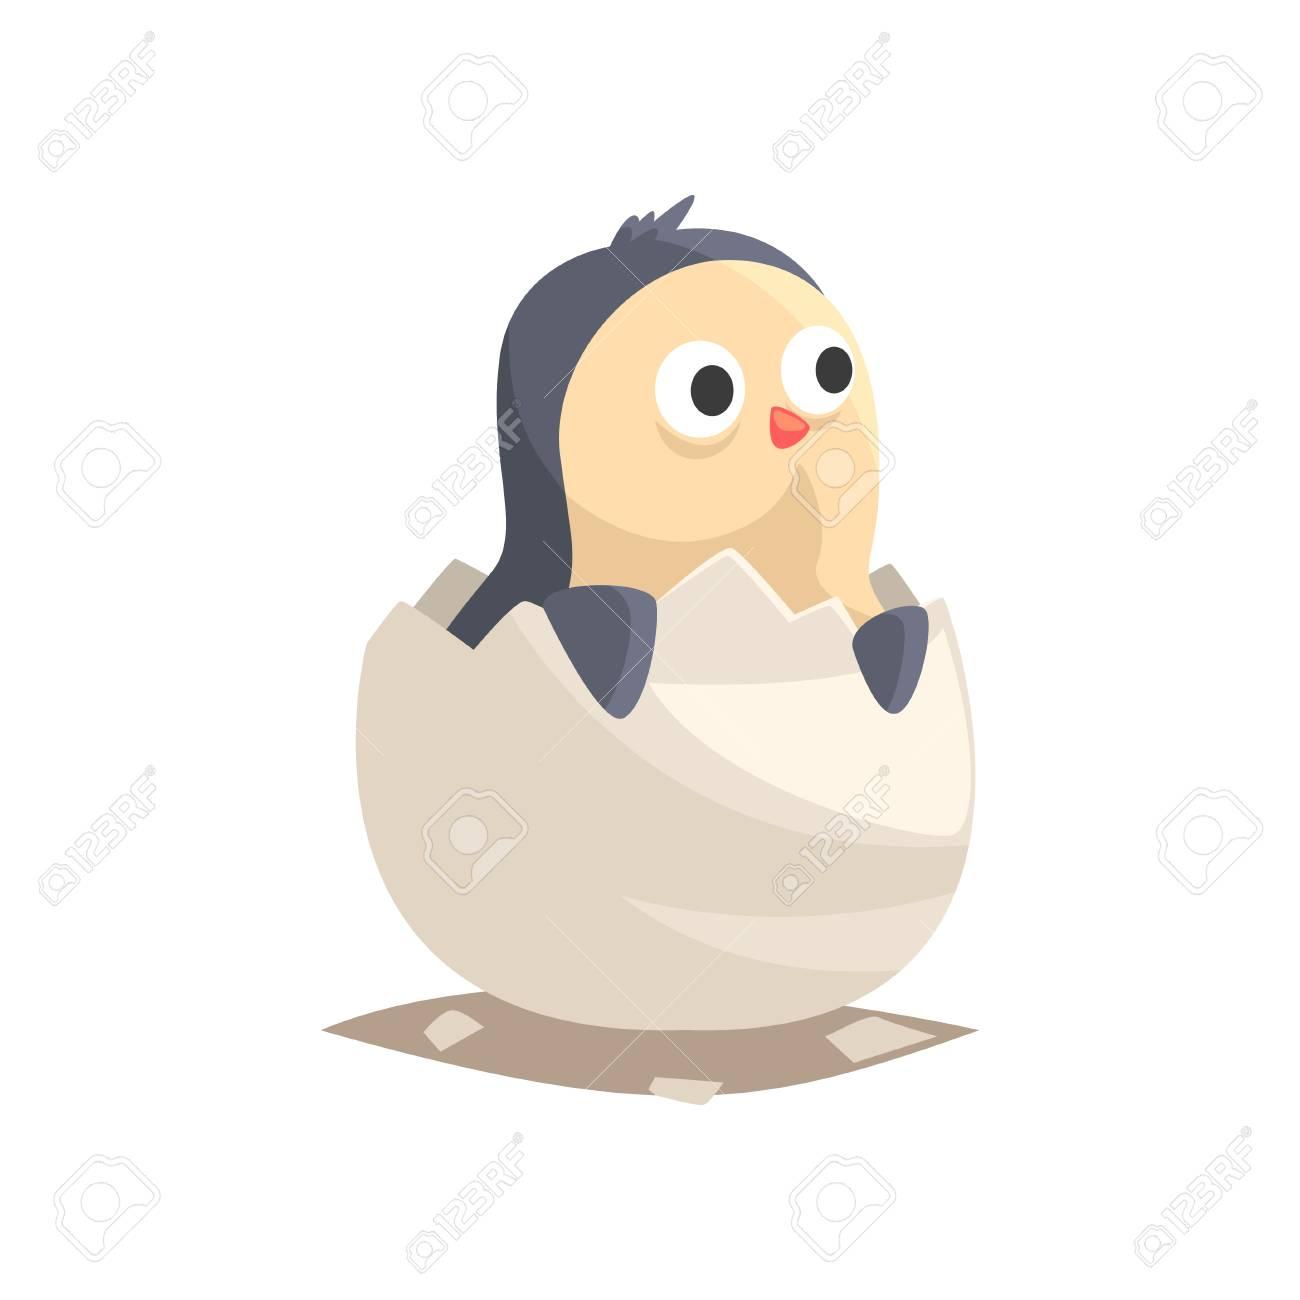 Adorable newborn penguin in broken egg shell baby aquatic bird hatching from egg little